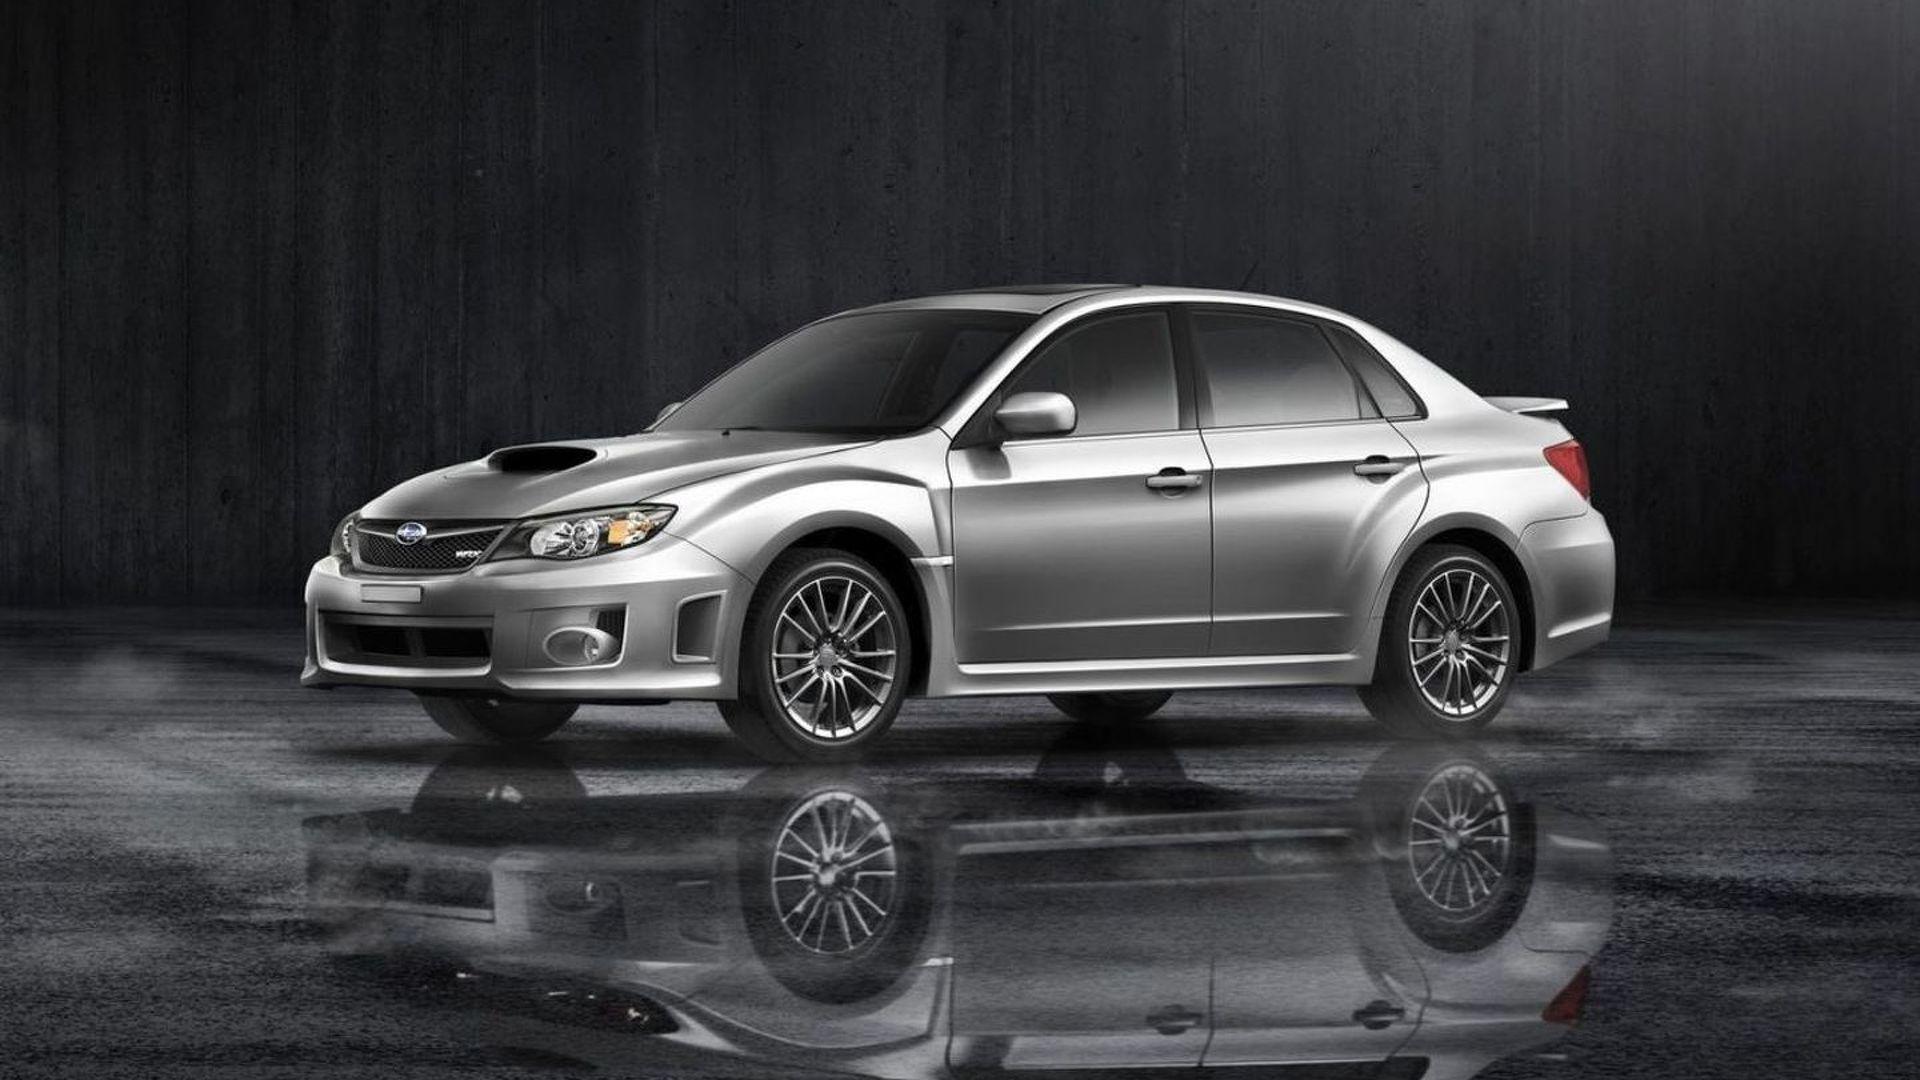 2011 Subaru Impreza WRX Facelift Gets Widebody - Debut in New York